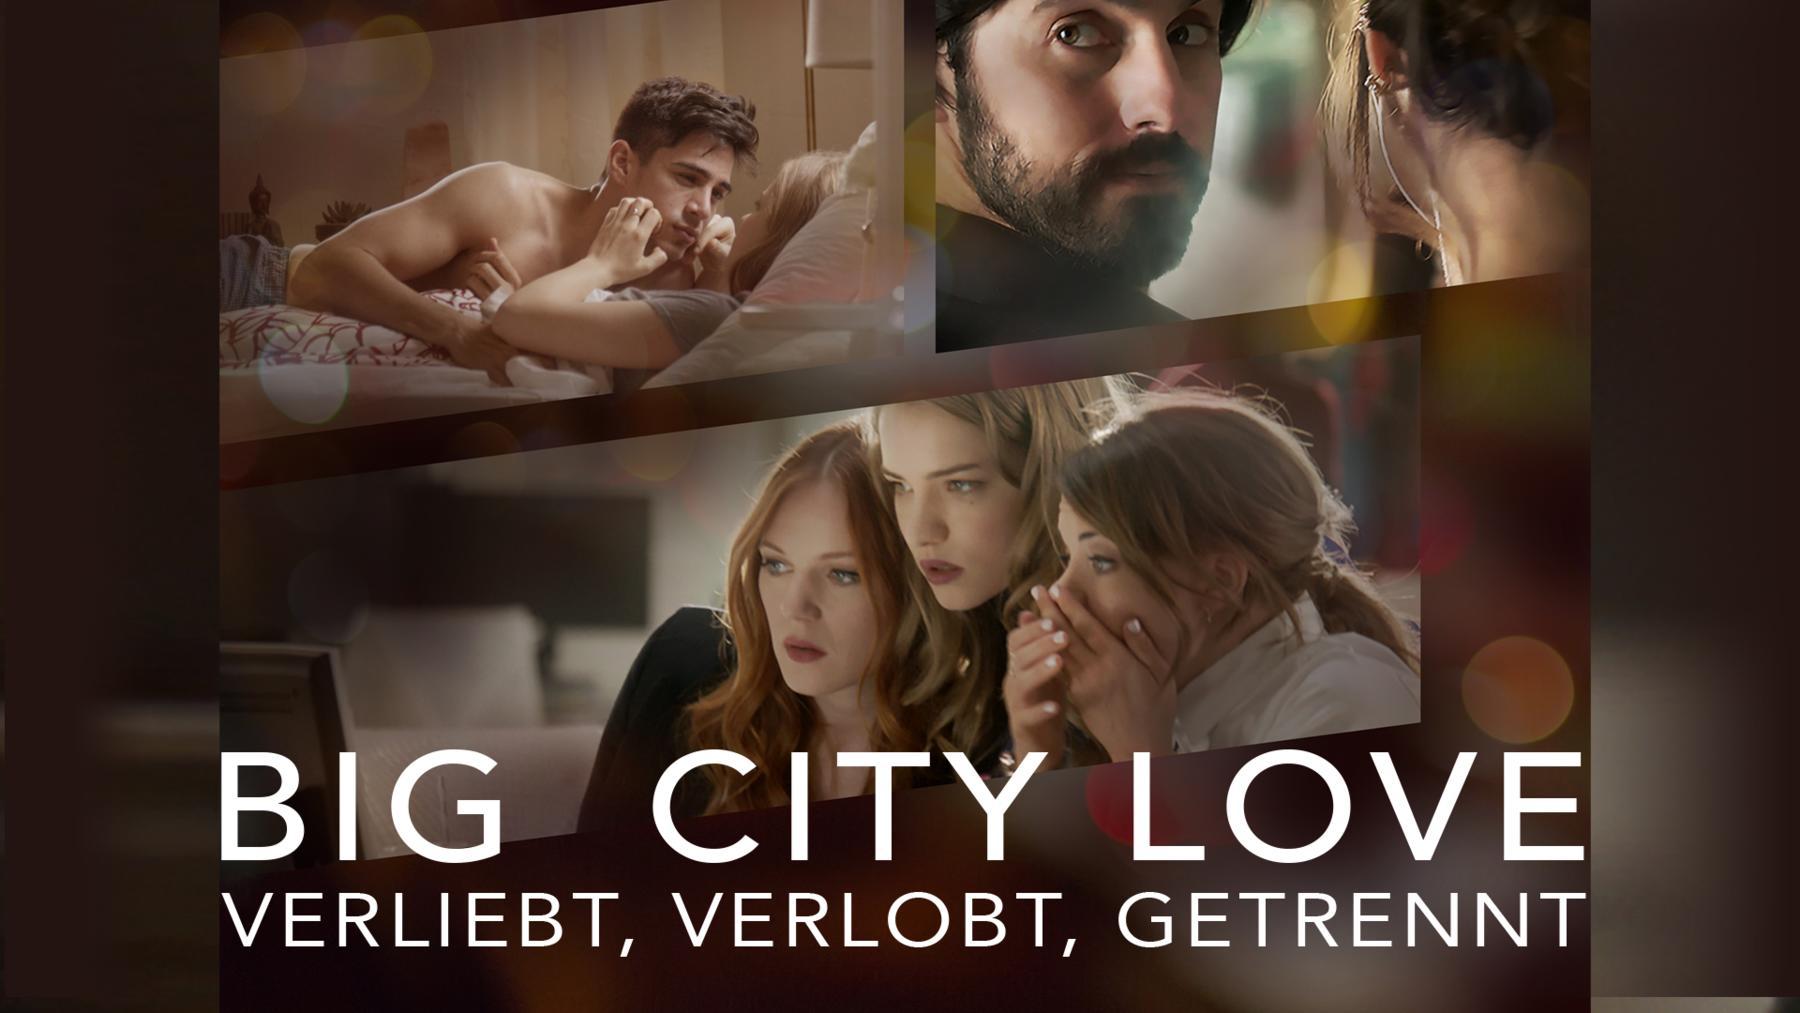 Big City Love - Verliebt, verlobt, getrennt